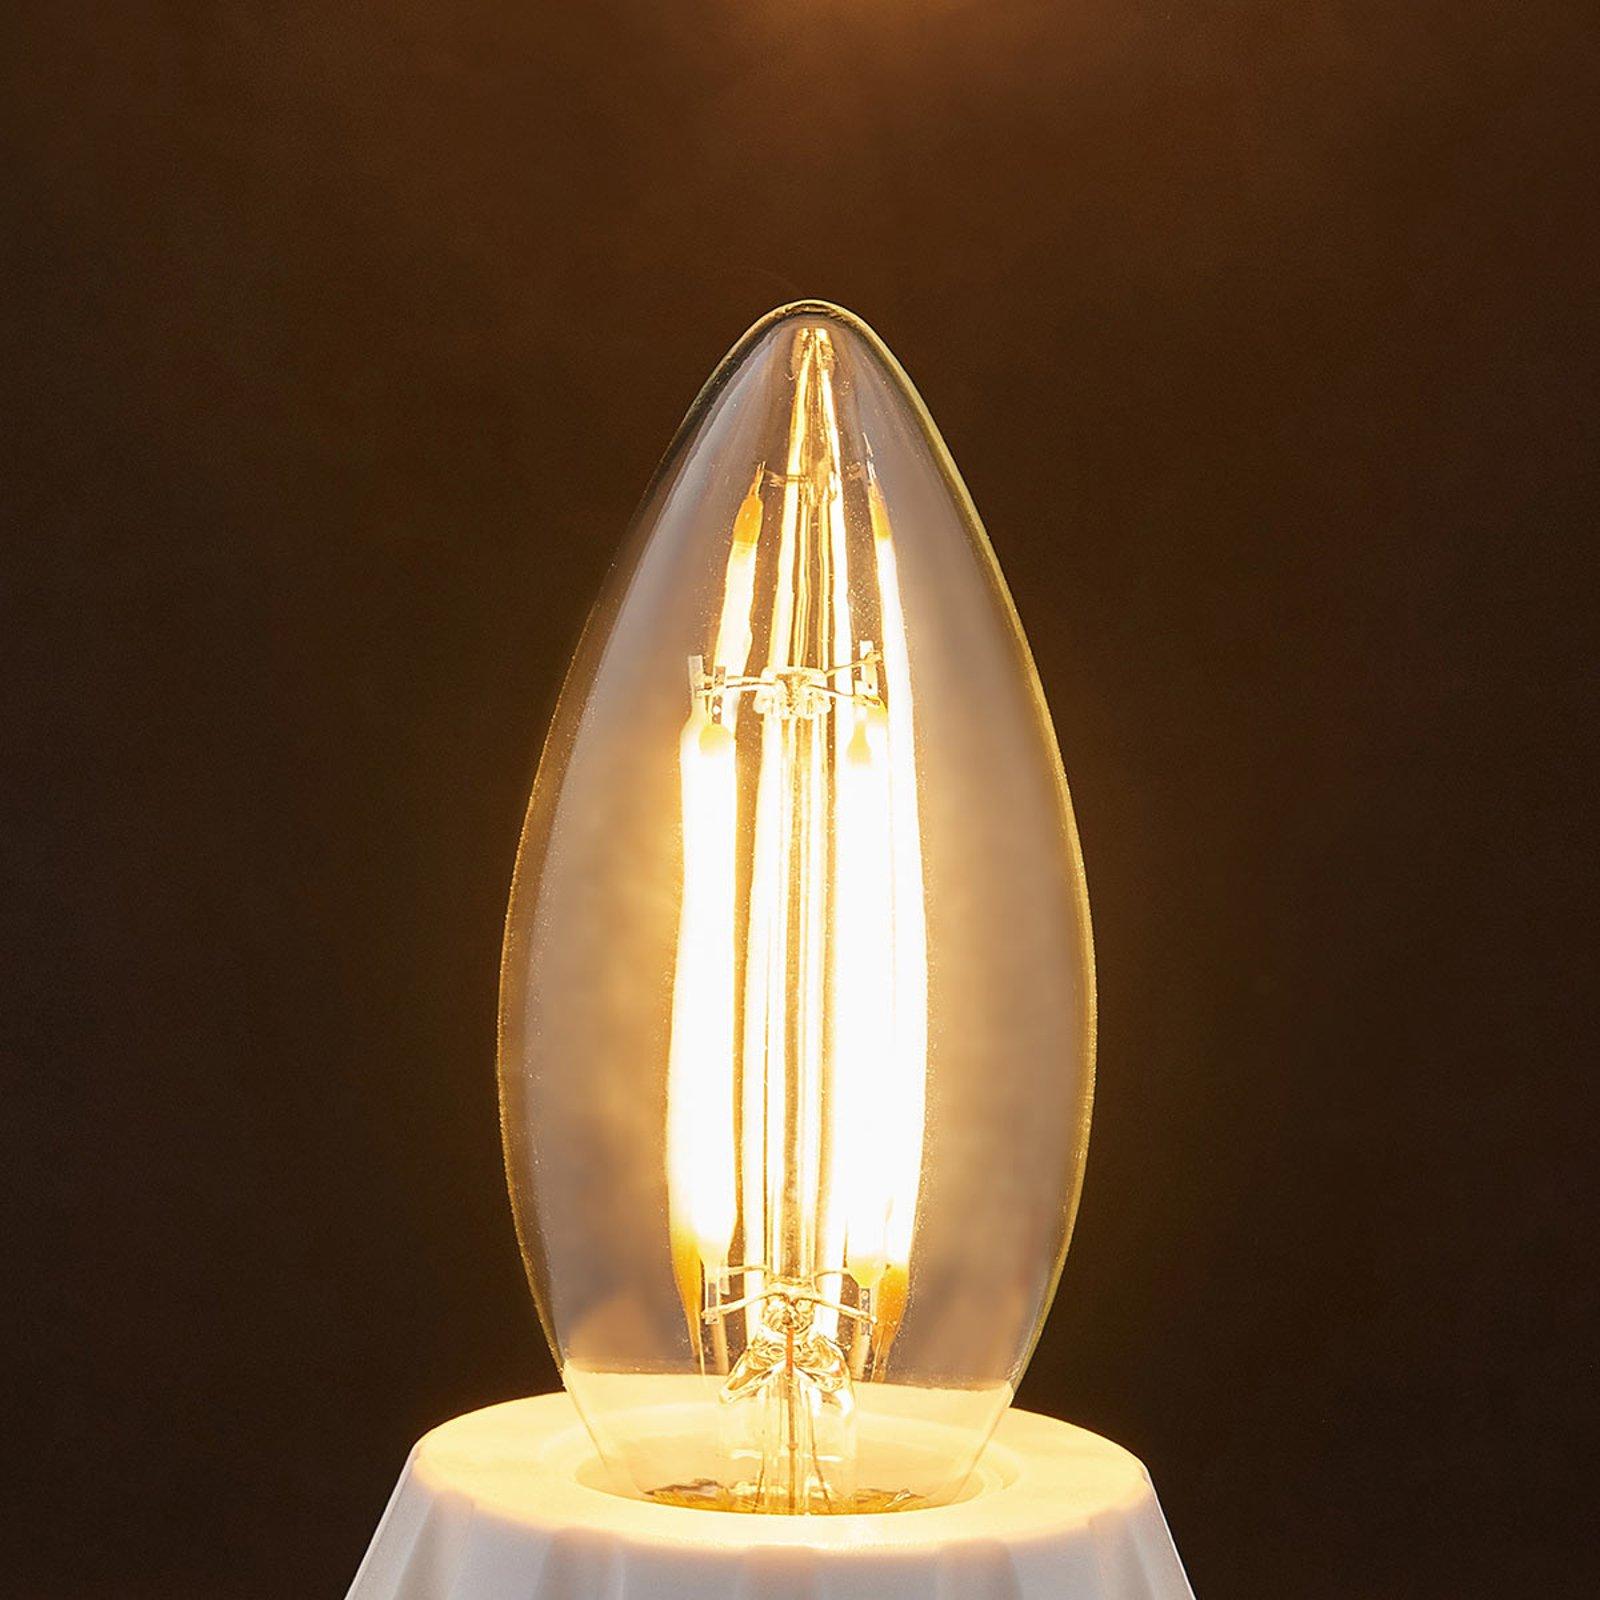 E14 LED-mignonpære filament 4 W, 470 lm, 2 700 K